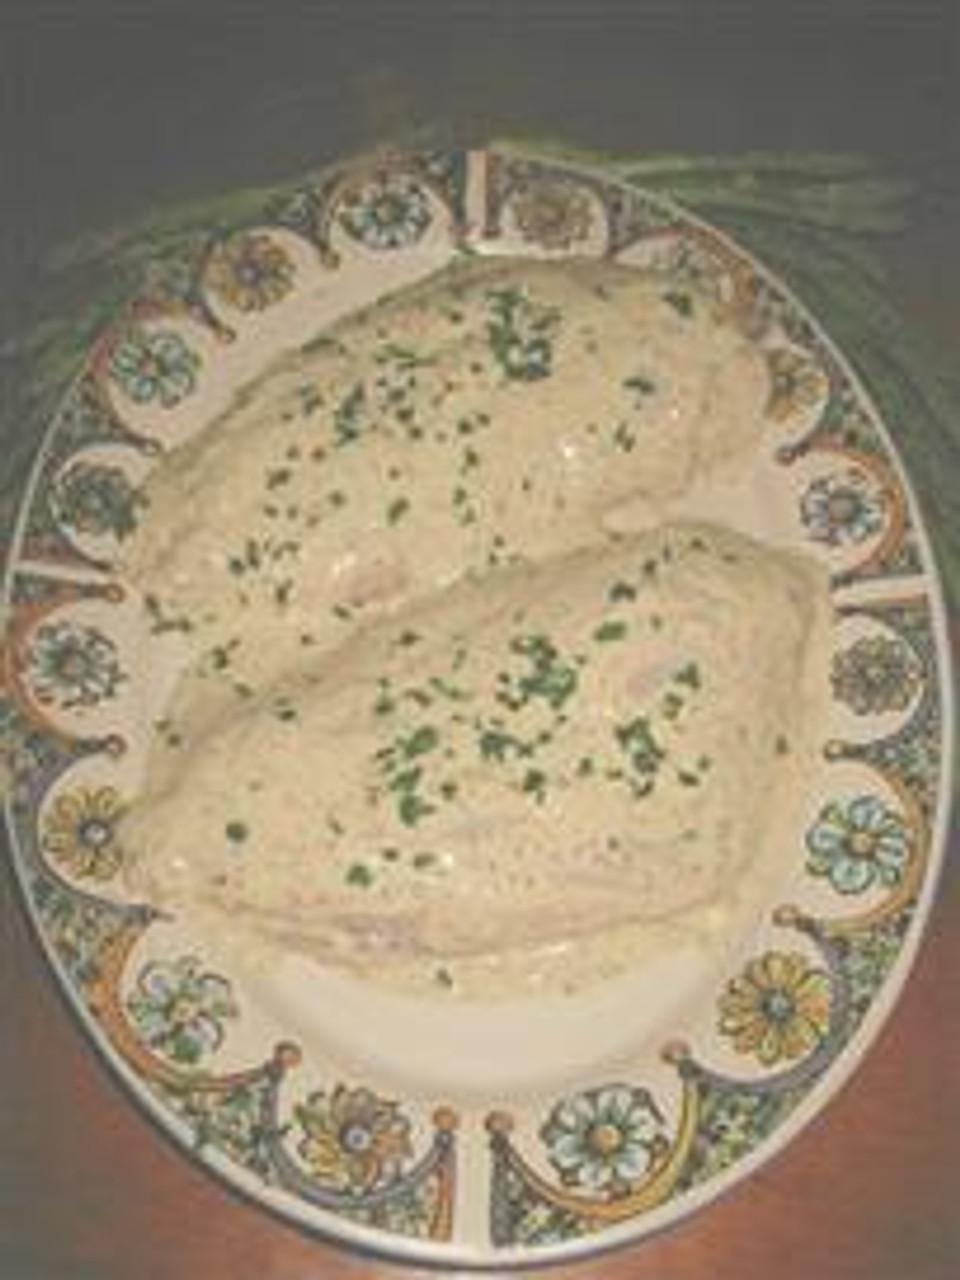 Marinated Turkey London Broil